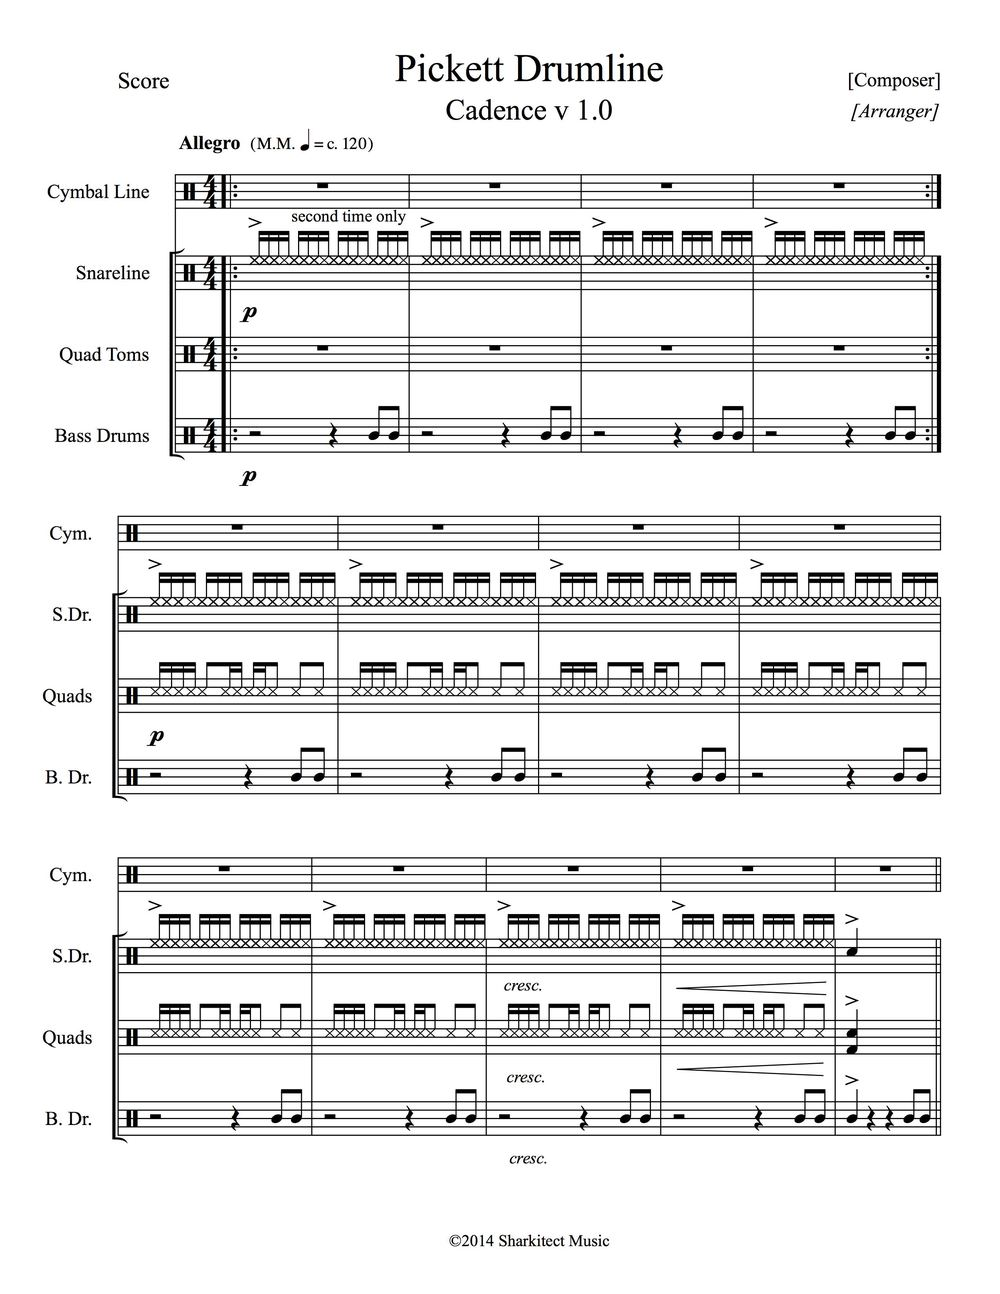 Cadence - score.jpg